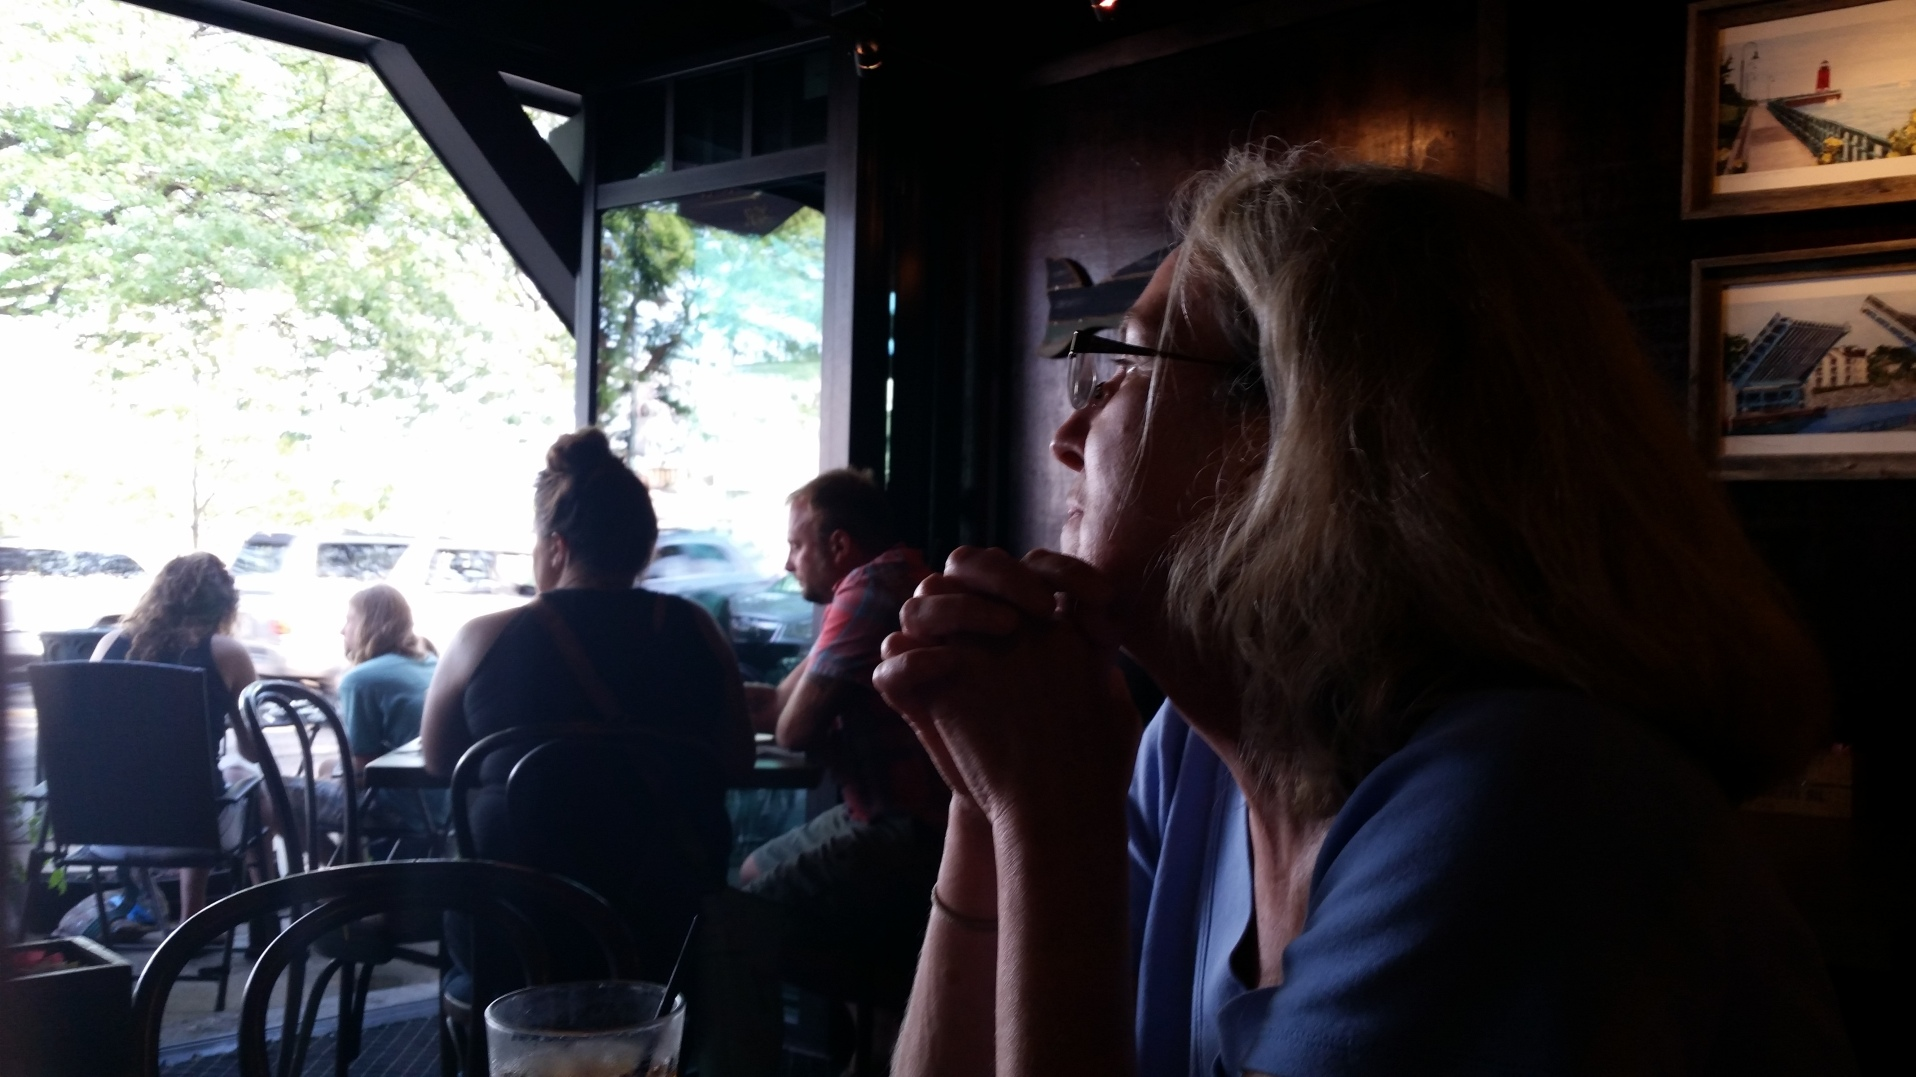 East Park Tavern in Charlevoix, MI www.usathroughoureyes.com